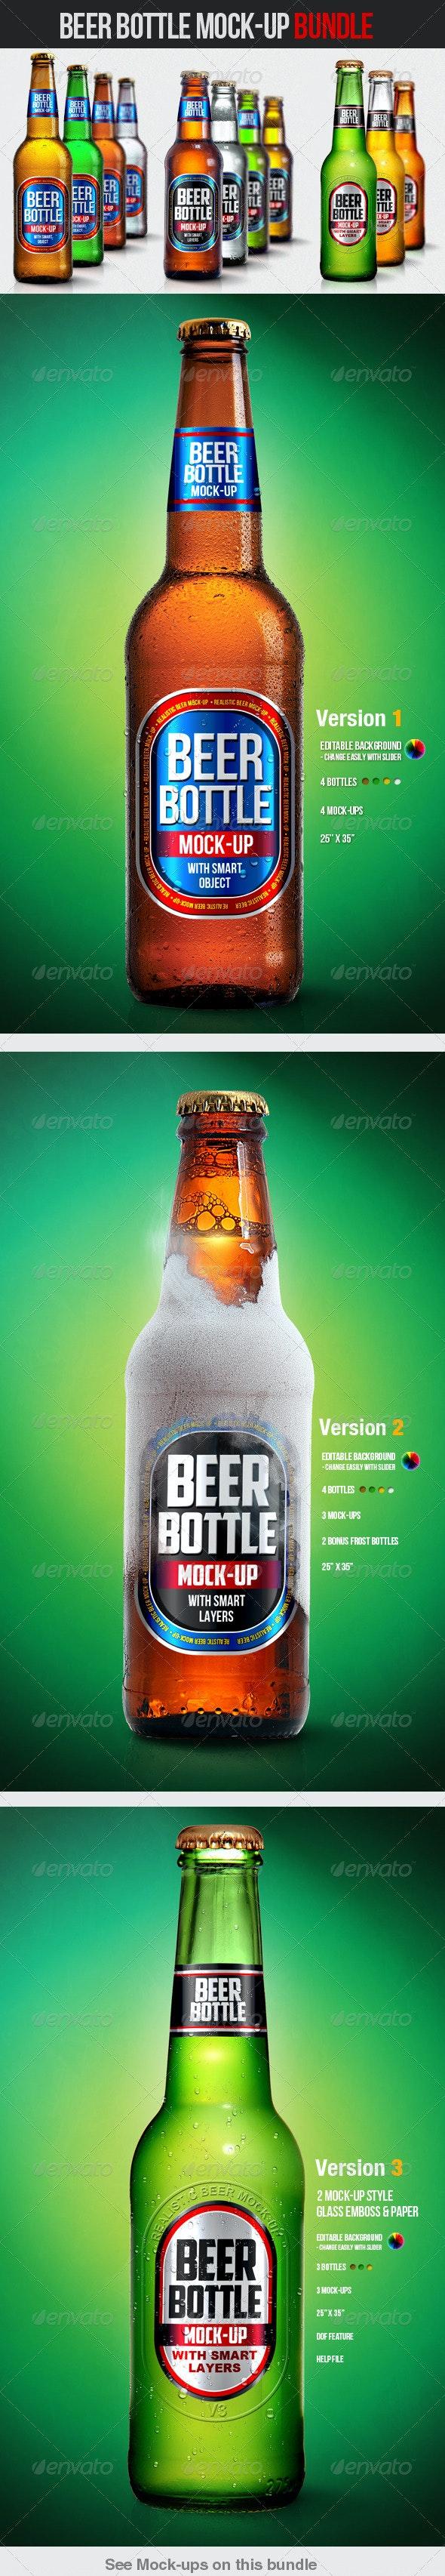 Beer Bottle Mock-Up Bundle - Food and Drink Packaging